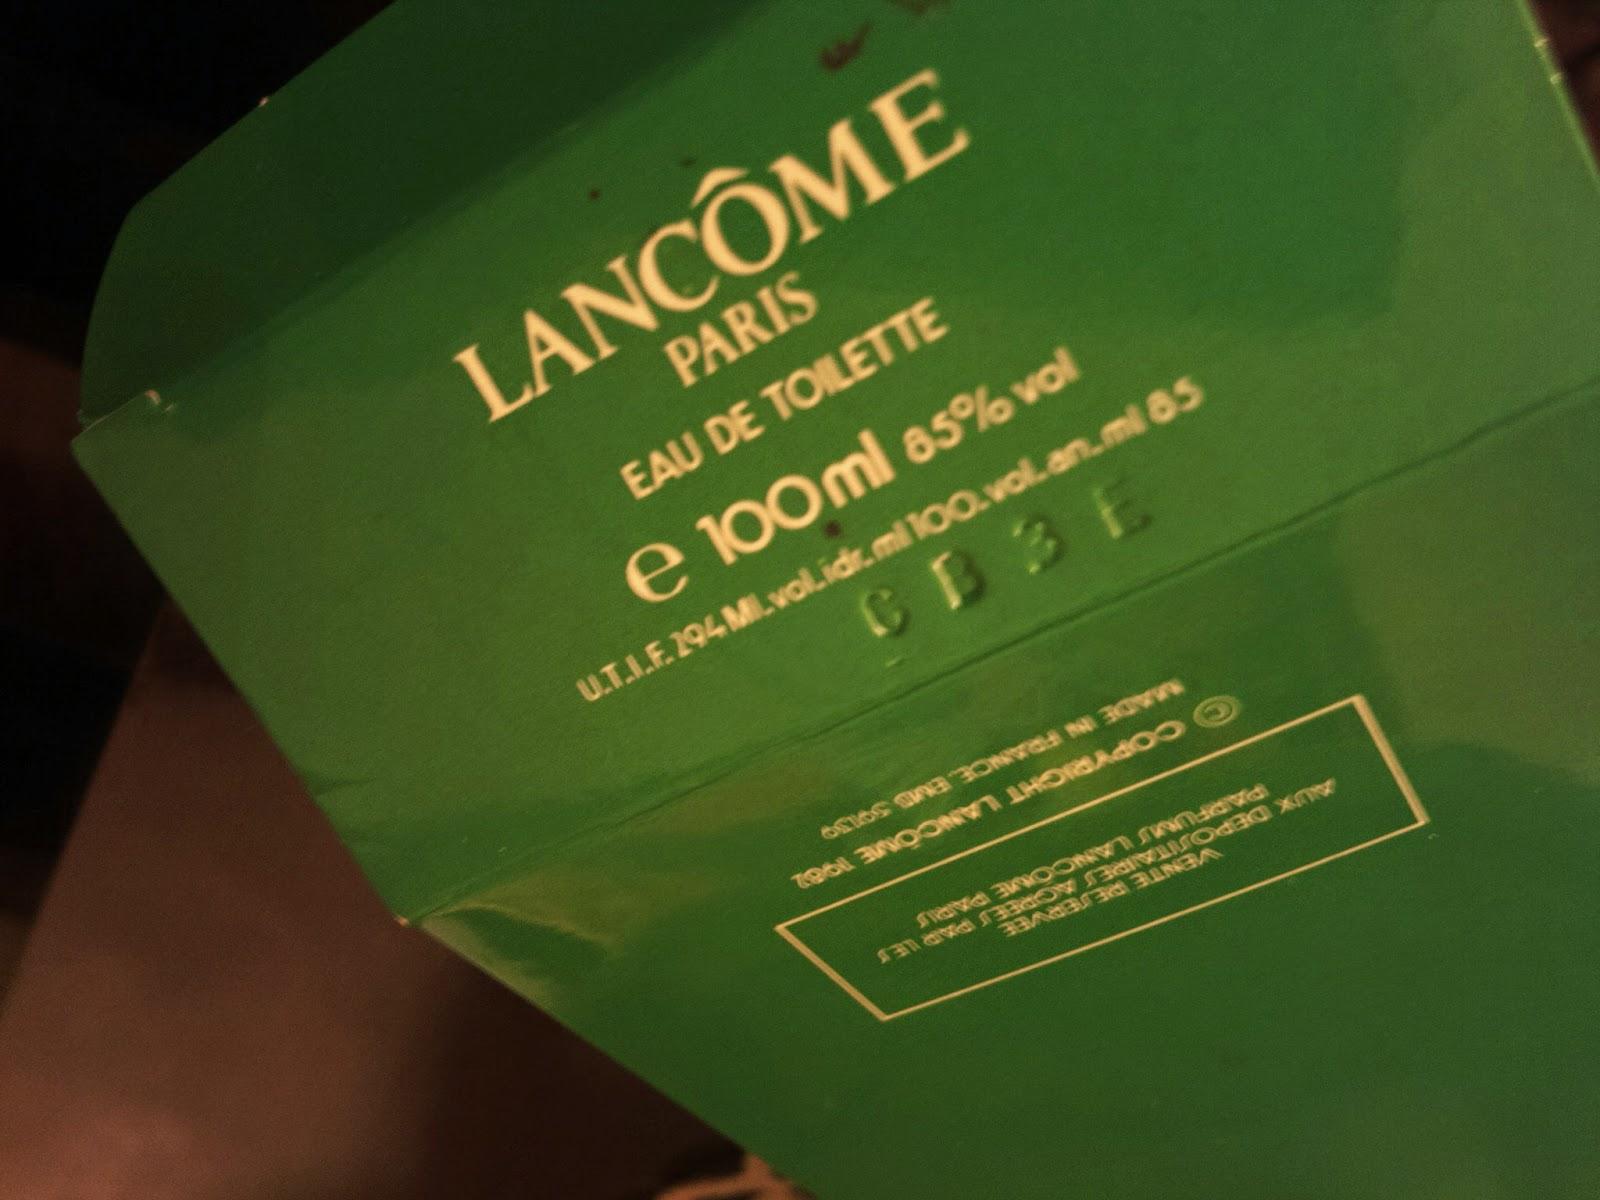 Trophèe Lancome